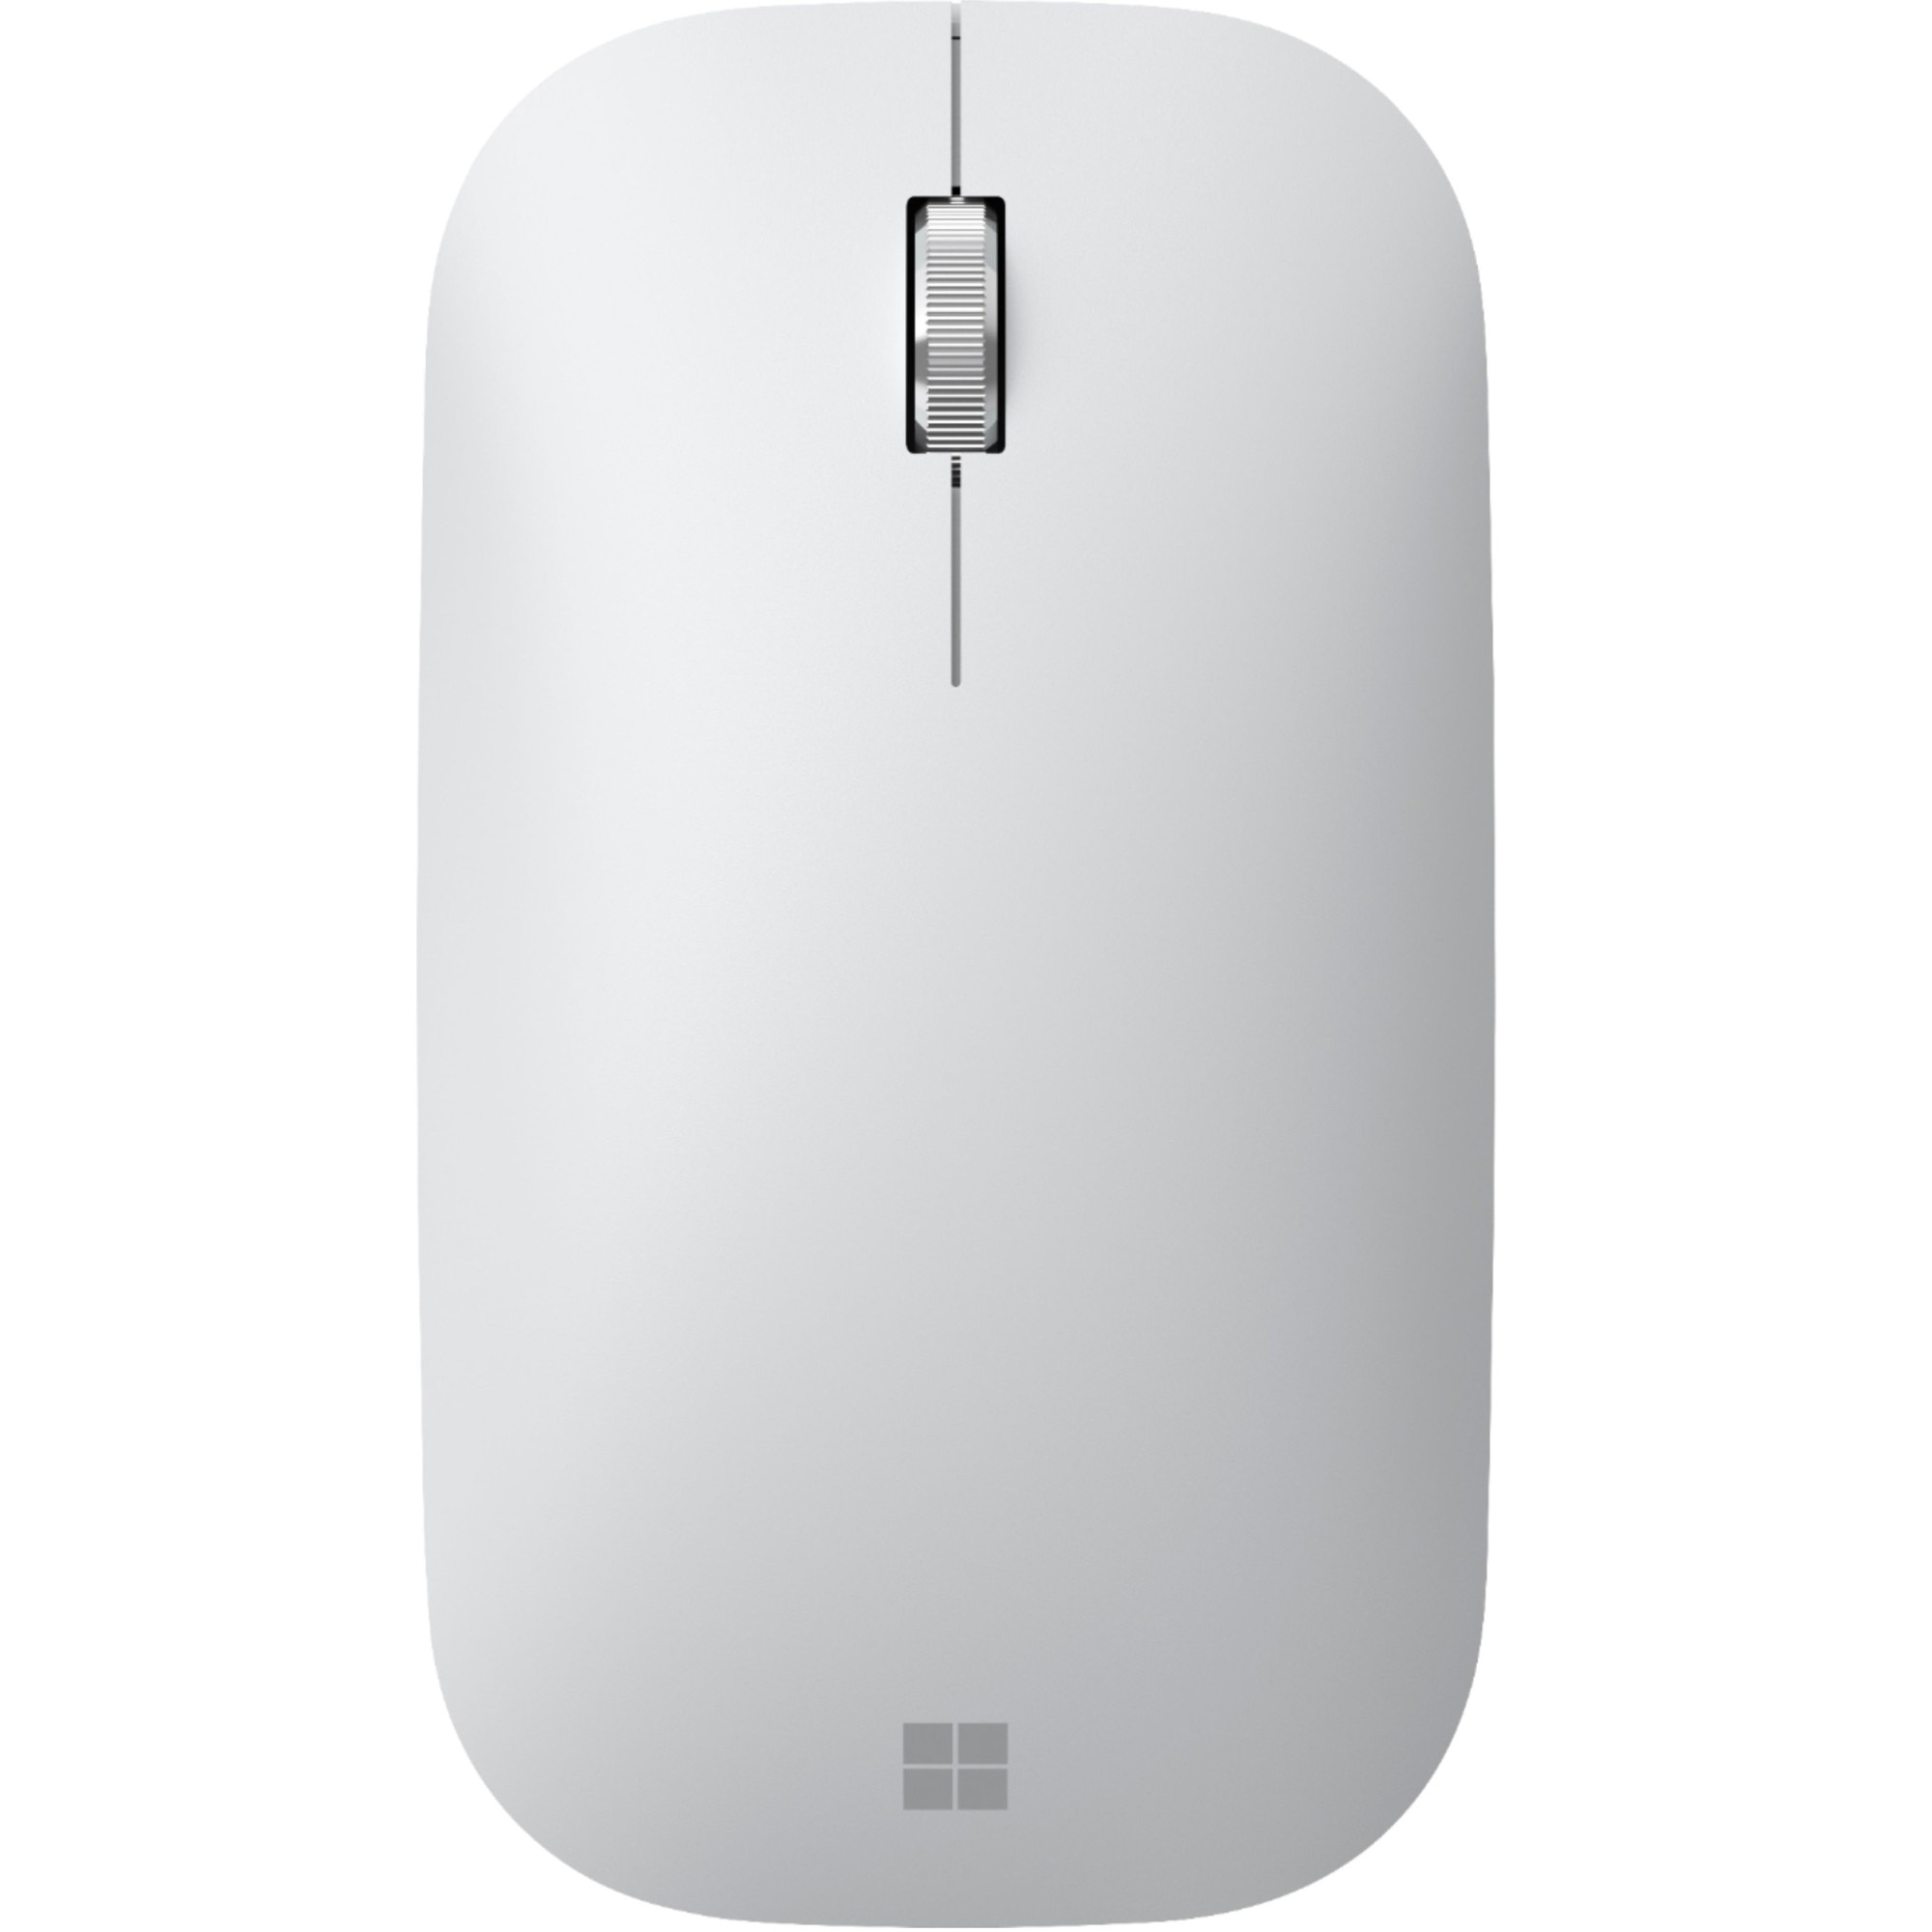 Fotografie Mouse Microsoft Modern, Wireless, Glacier